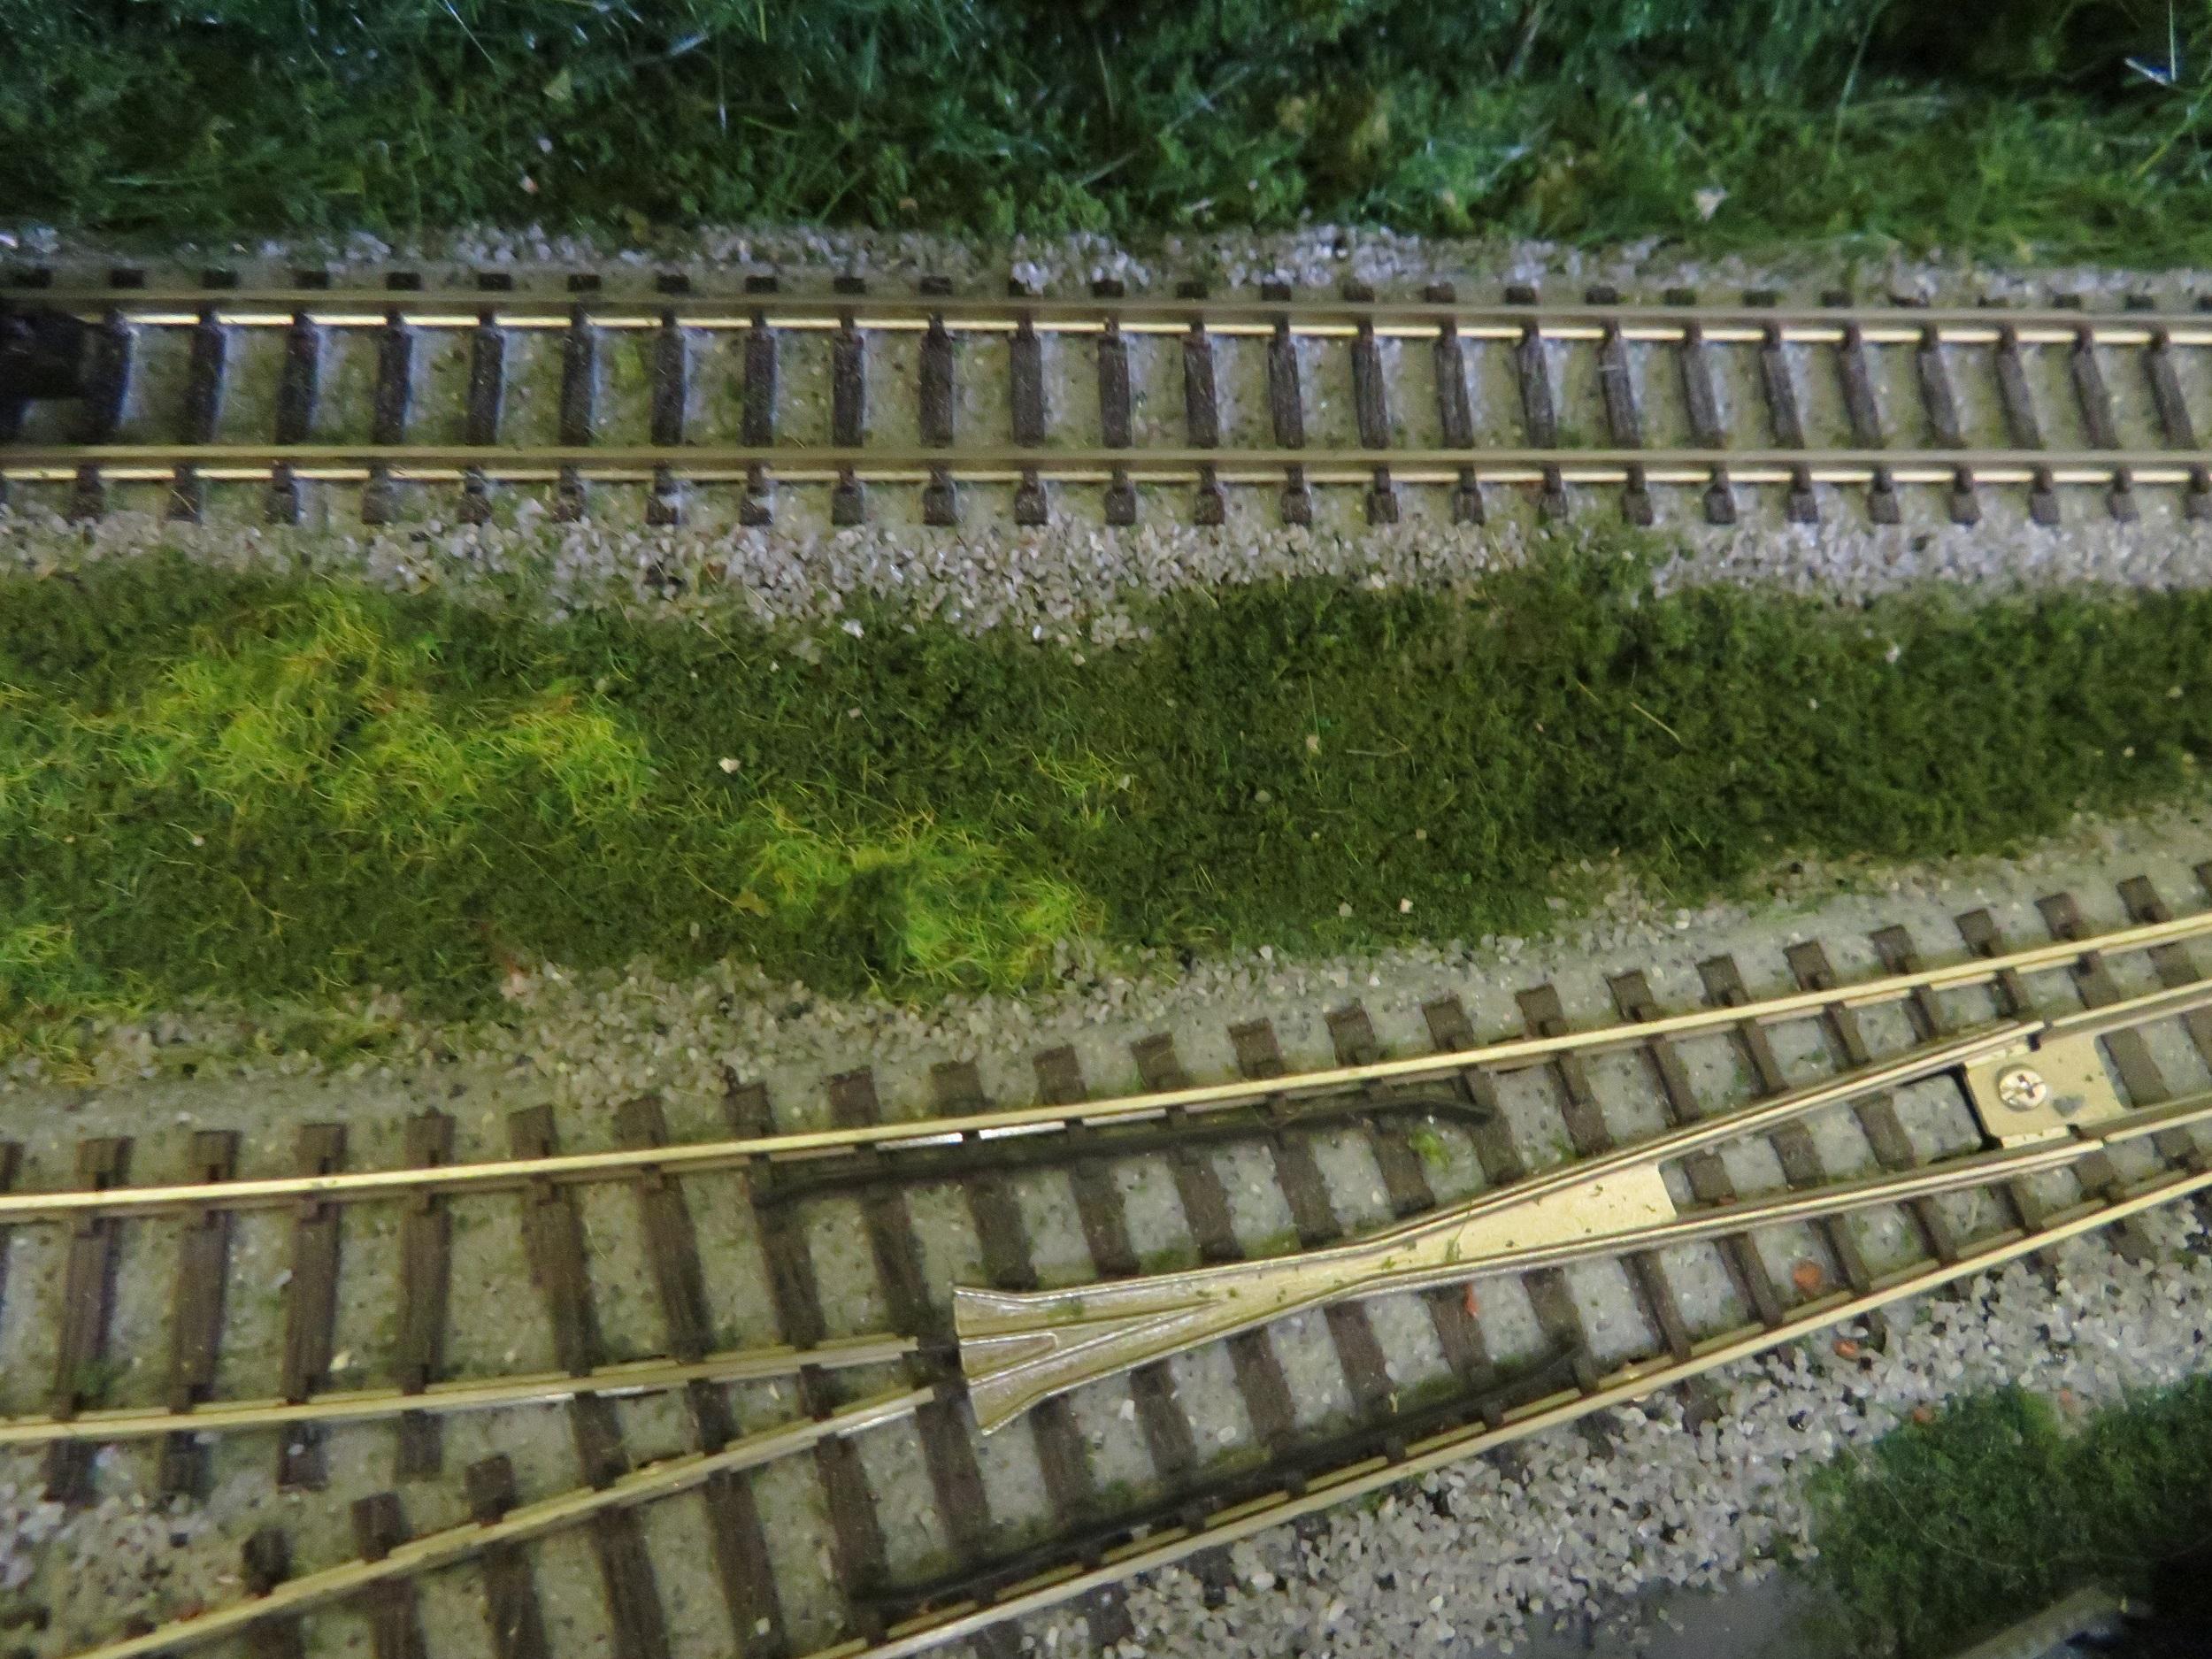 Kato track ballast